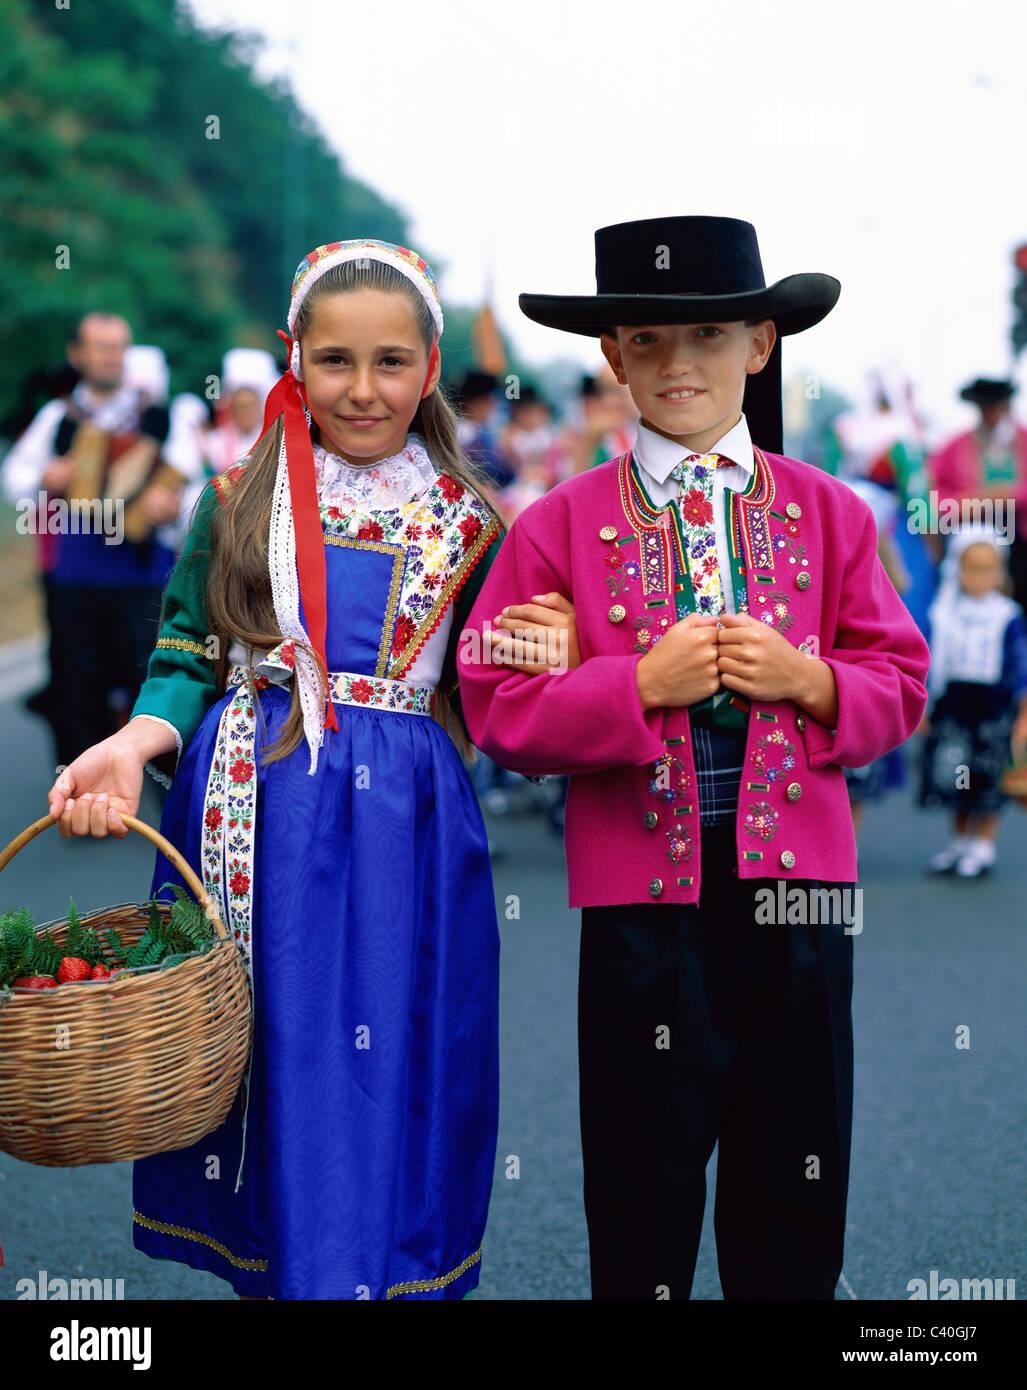 Brittany Children Costumes Couple Europe European